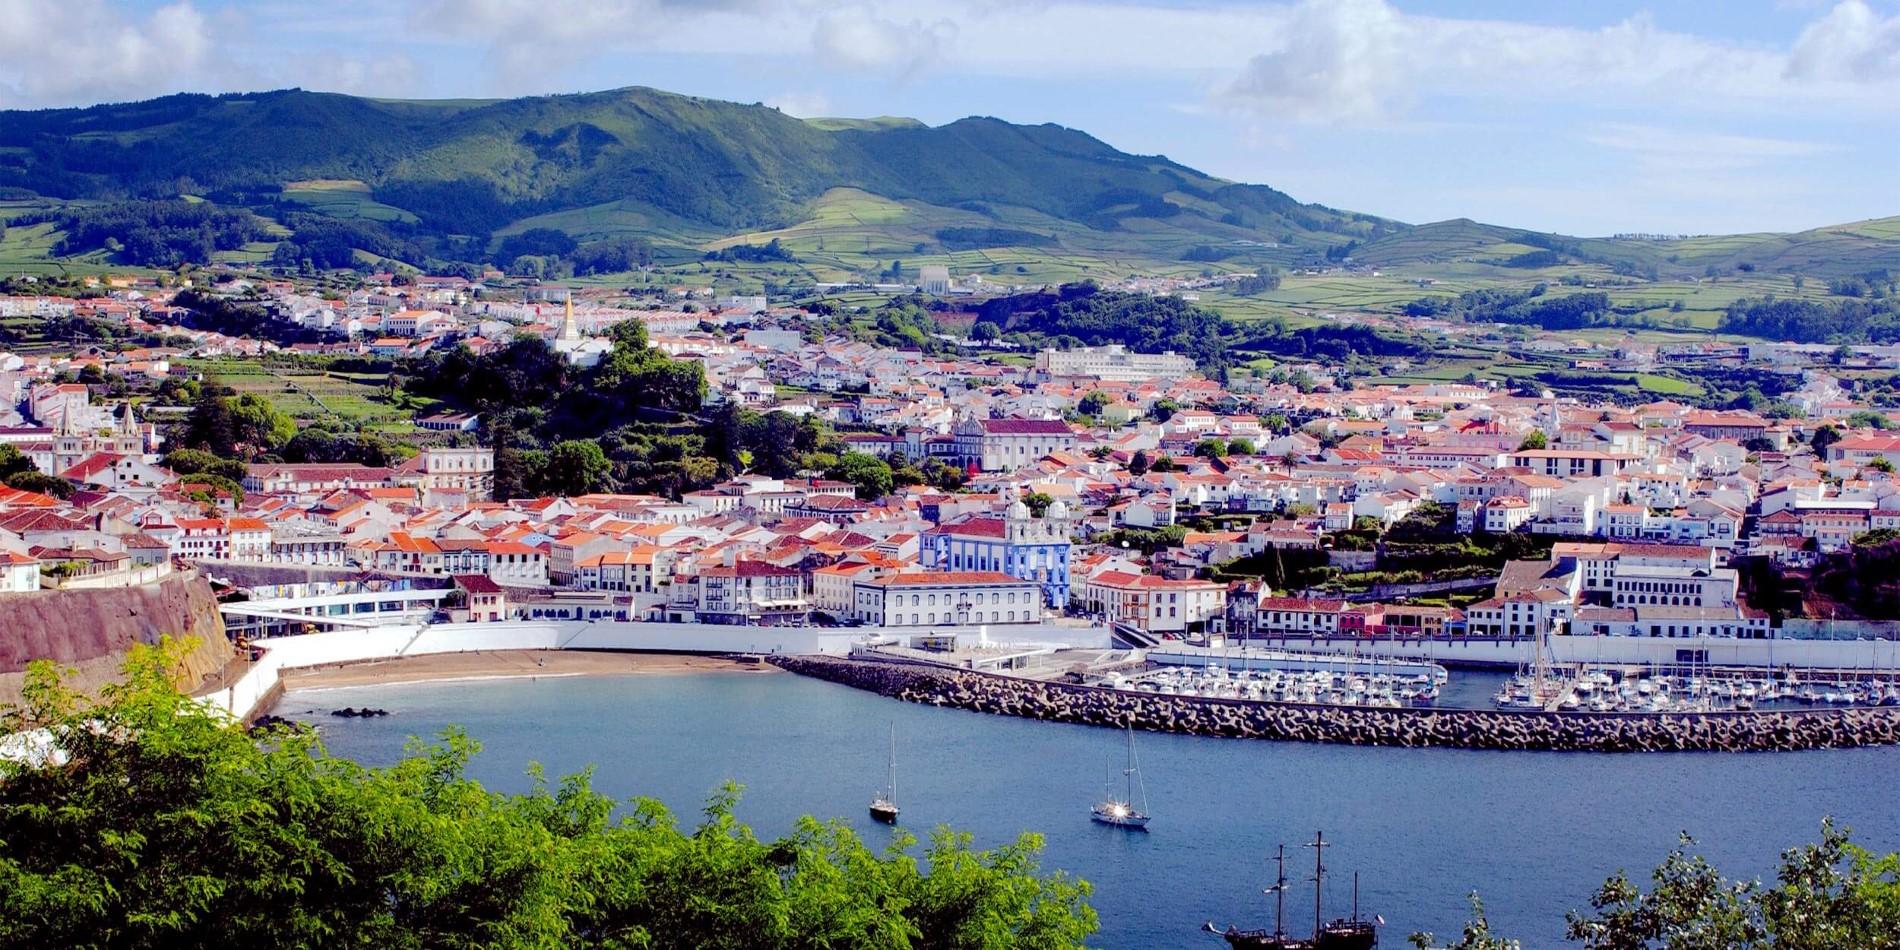 Angra-Heroísmo-I-Terceira-Island.jpg